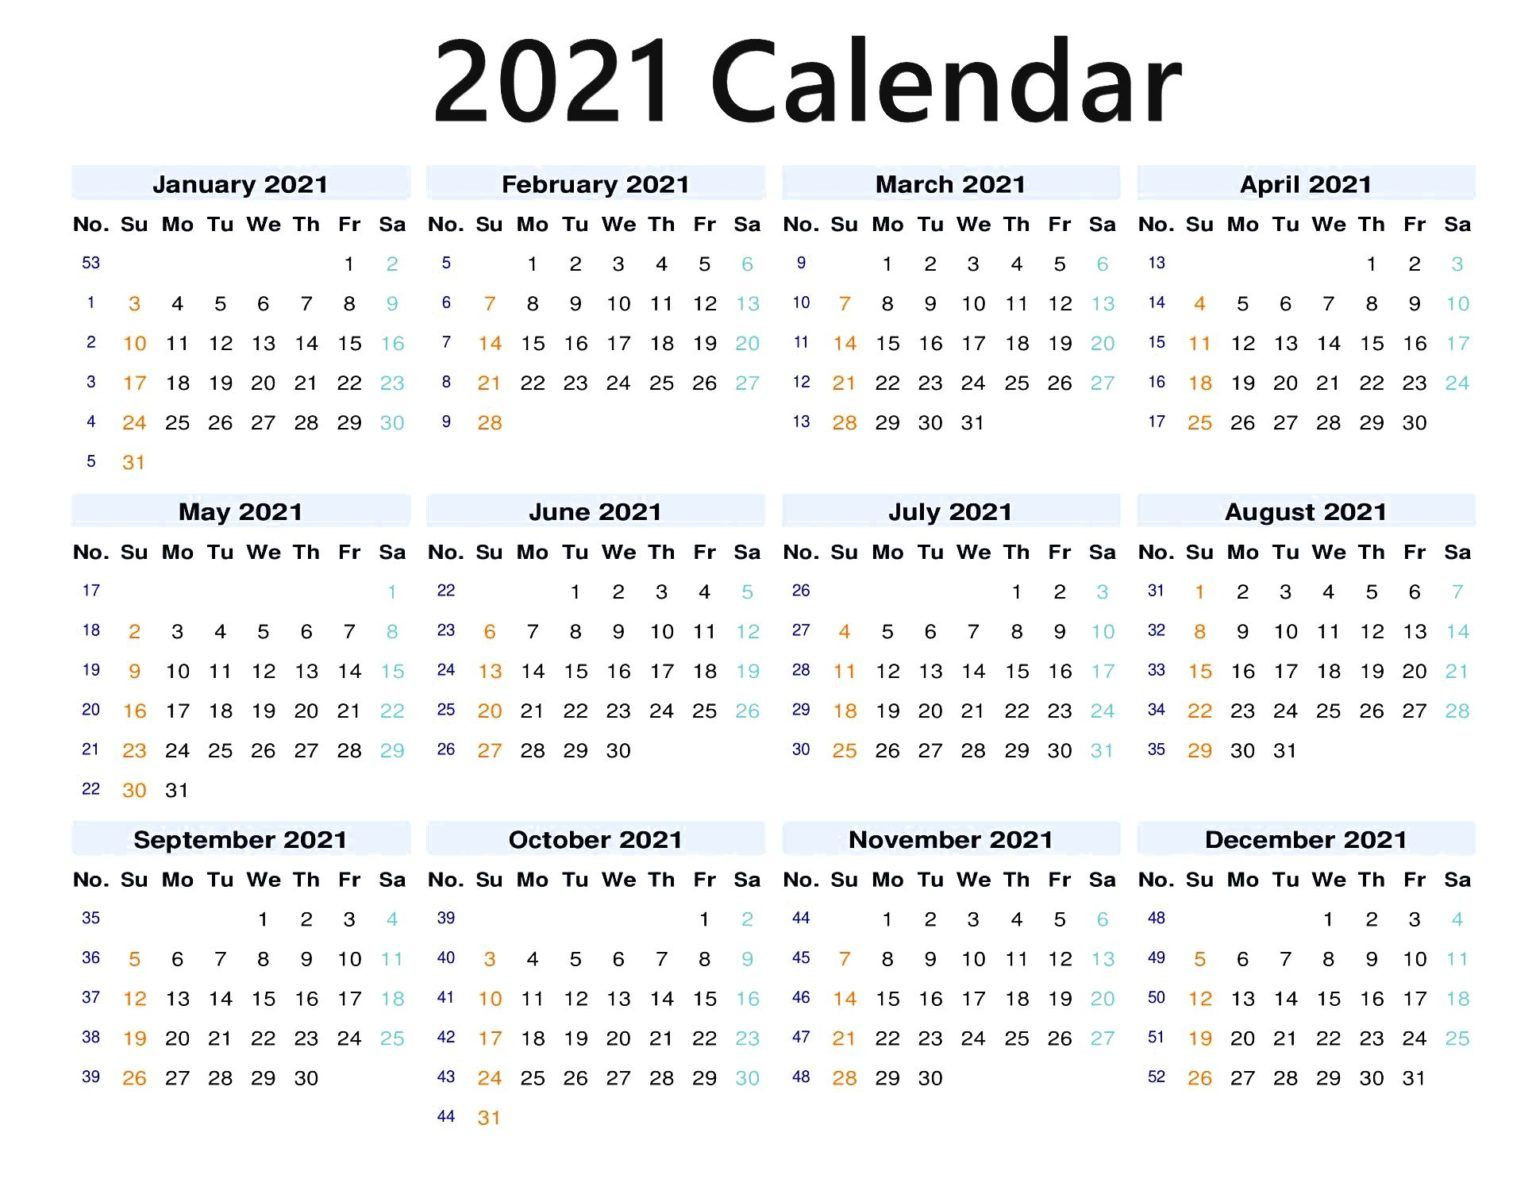 12 Months 2021 Blank Calendar In 2020 | 2021 Calendar-3 Month Printable Calendar Templates 2021